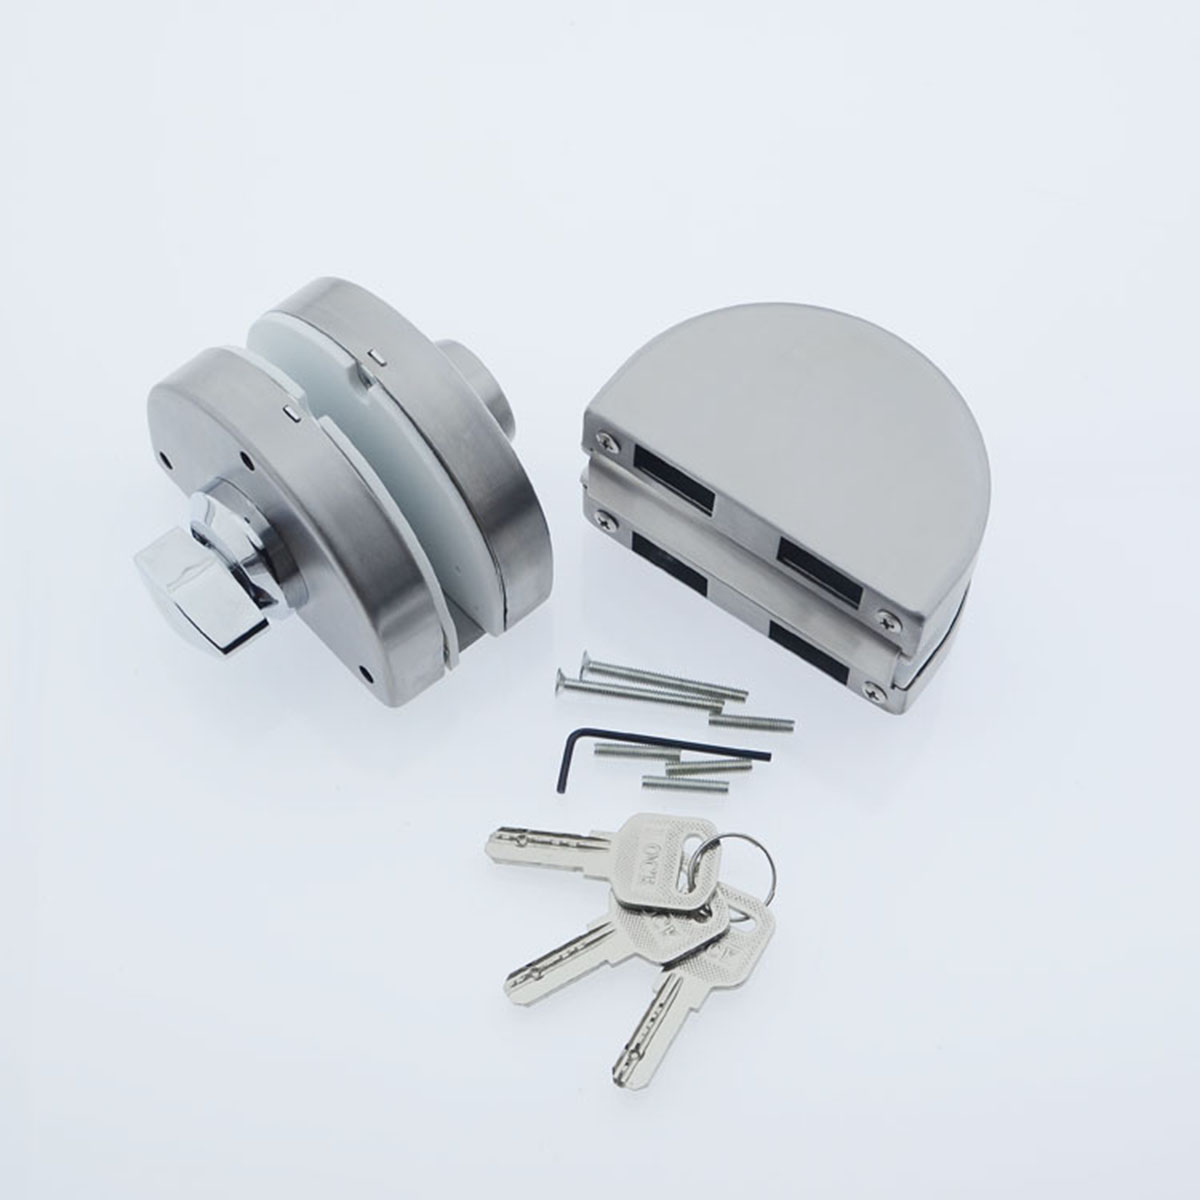 Sliding glass door lock - New 10 12mm Glass Door Lock Stainless Steel Double Bolts Swing Push Sliding Access Control